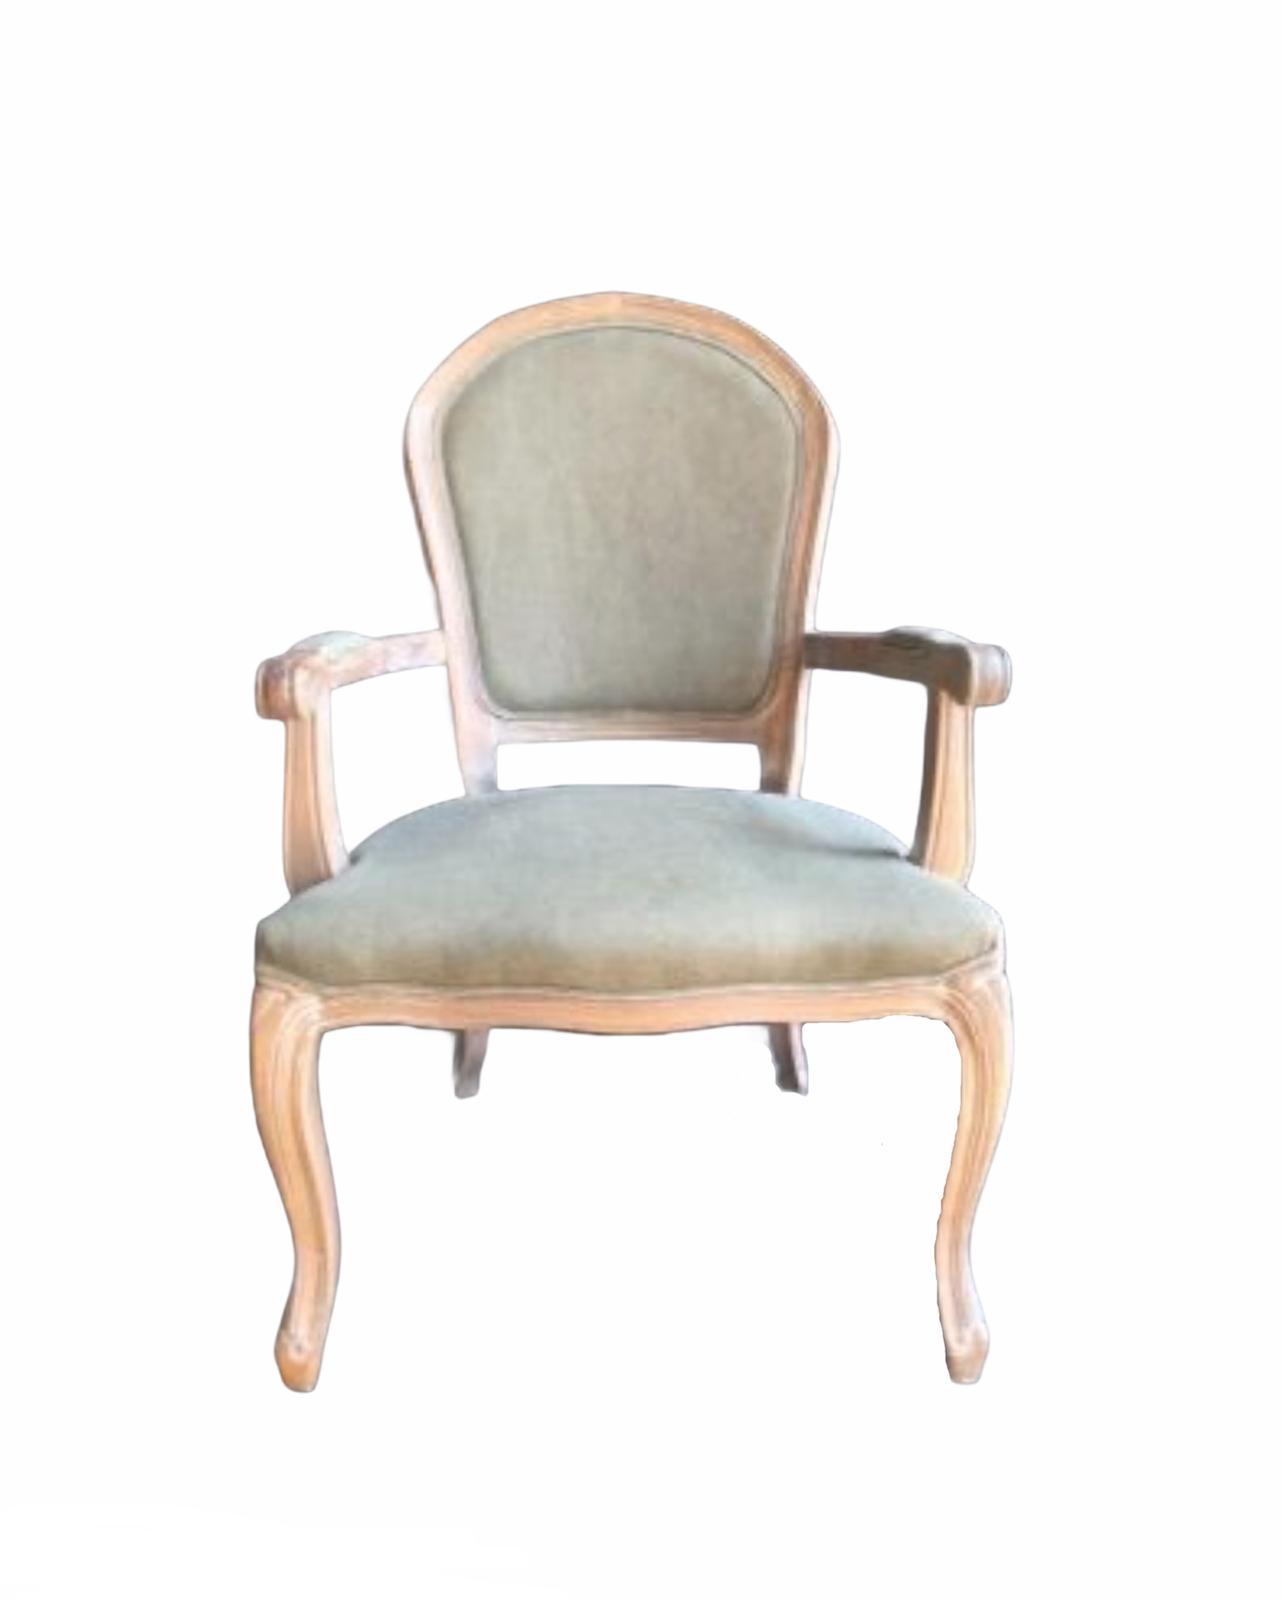 Atpūtas krēsls (ATKR90) Armchair for rent Кресло для отдыха